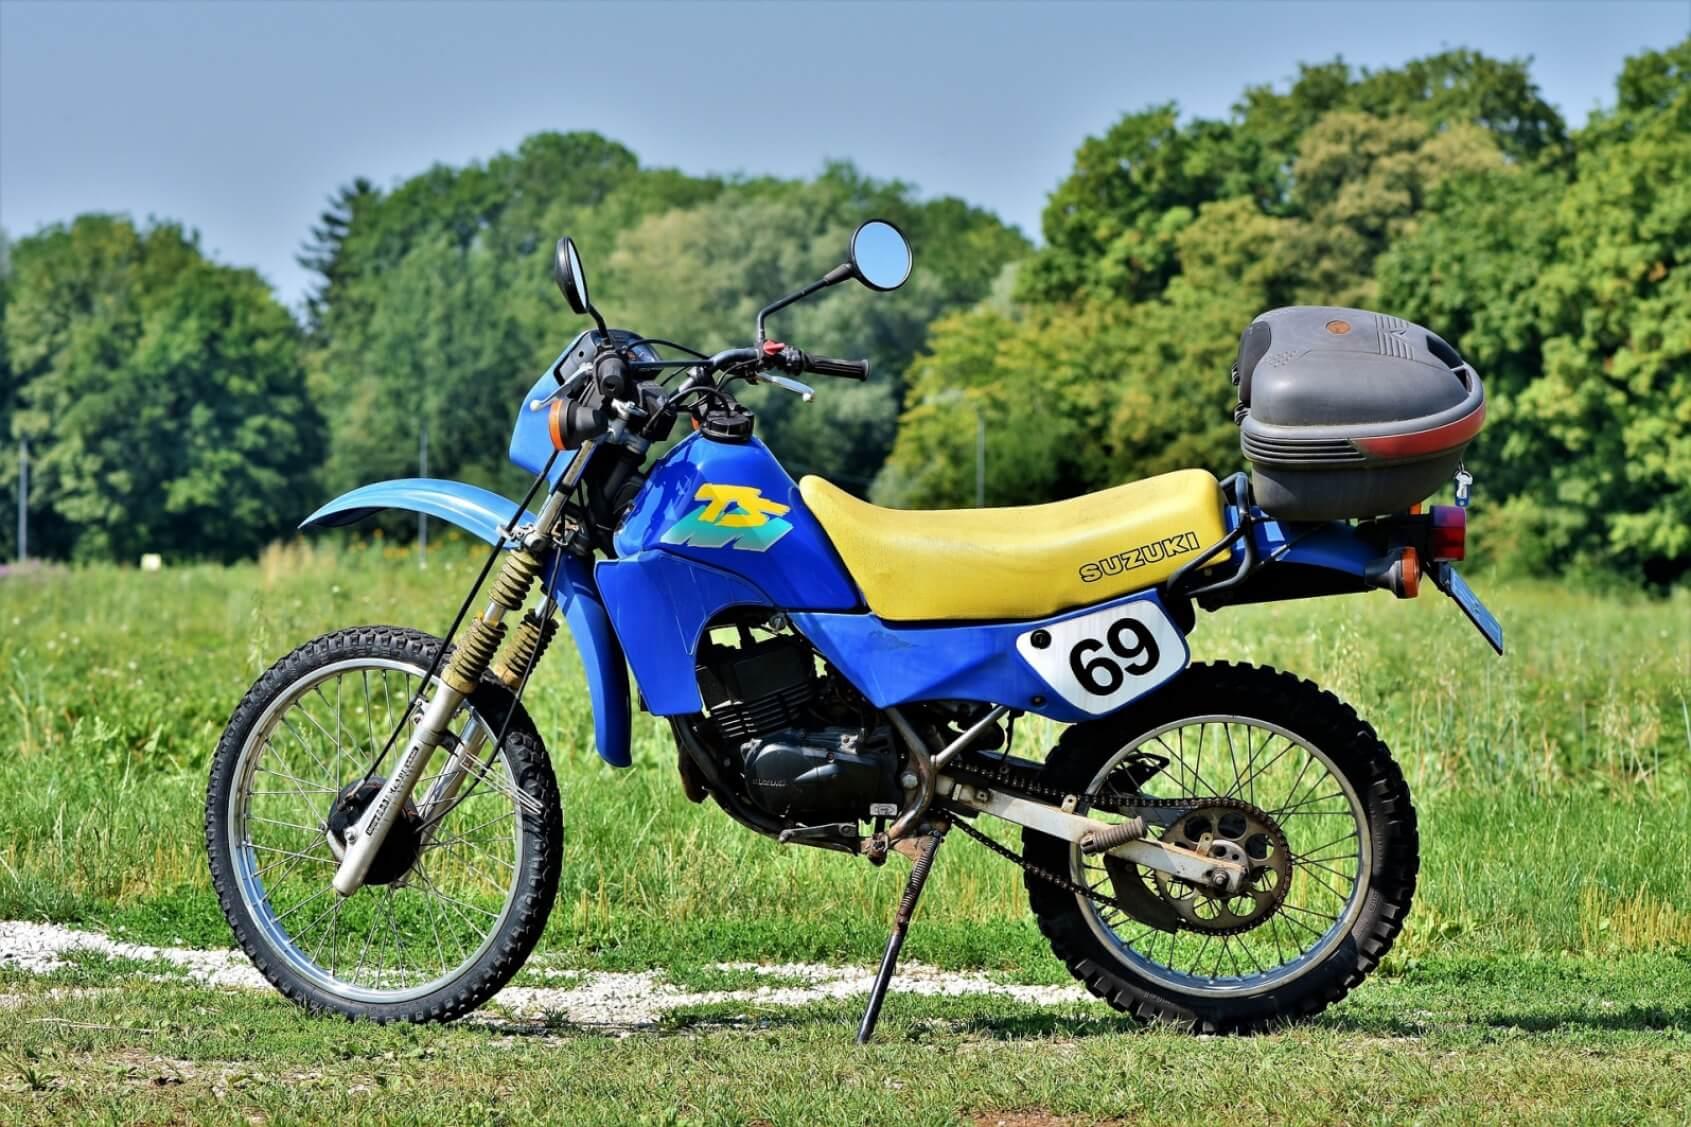 Suzuki Enduro Motorcycle - Original image